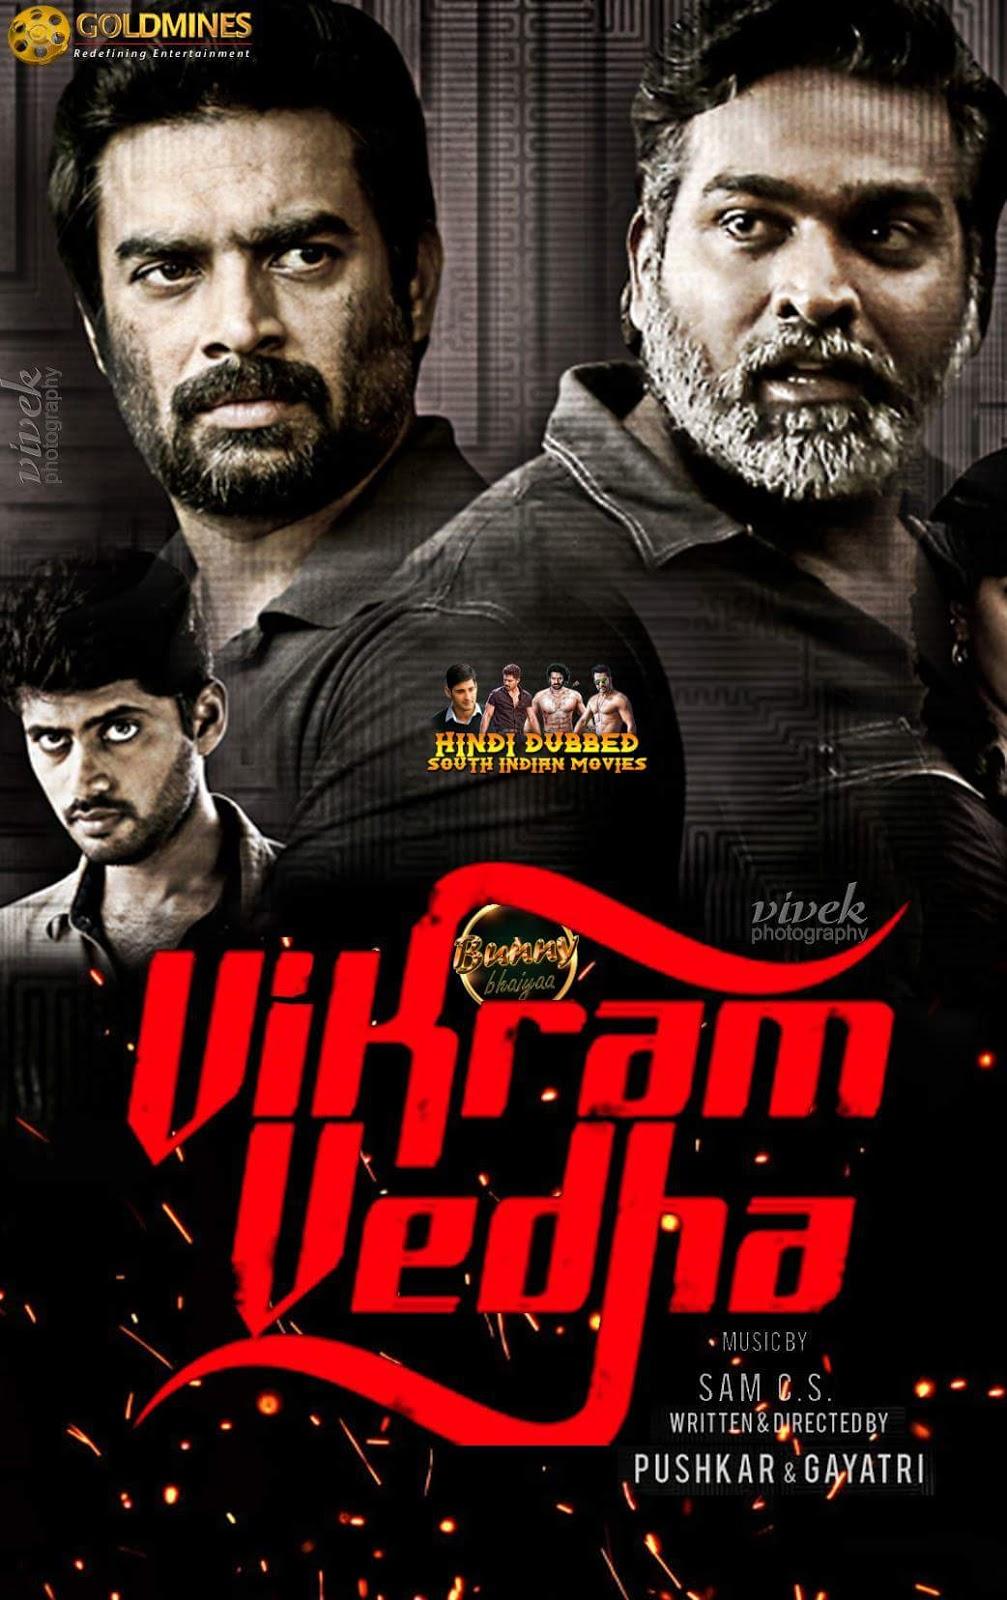 Vikram Vedha Hindi Dubbed Full Movie 2017